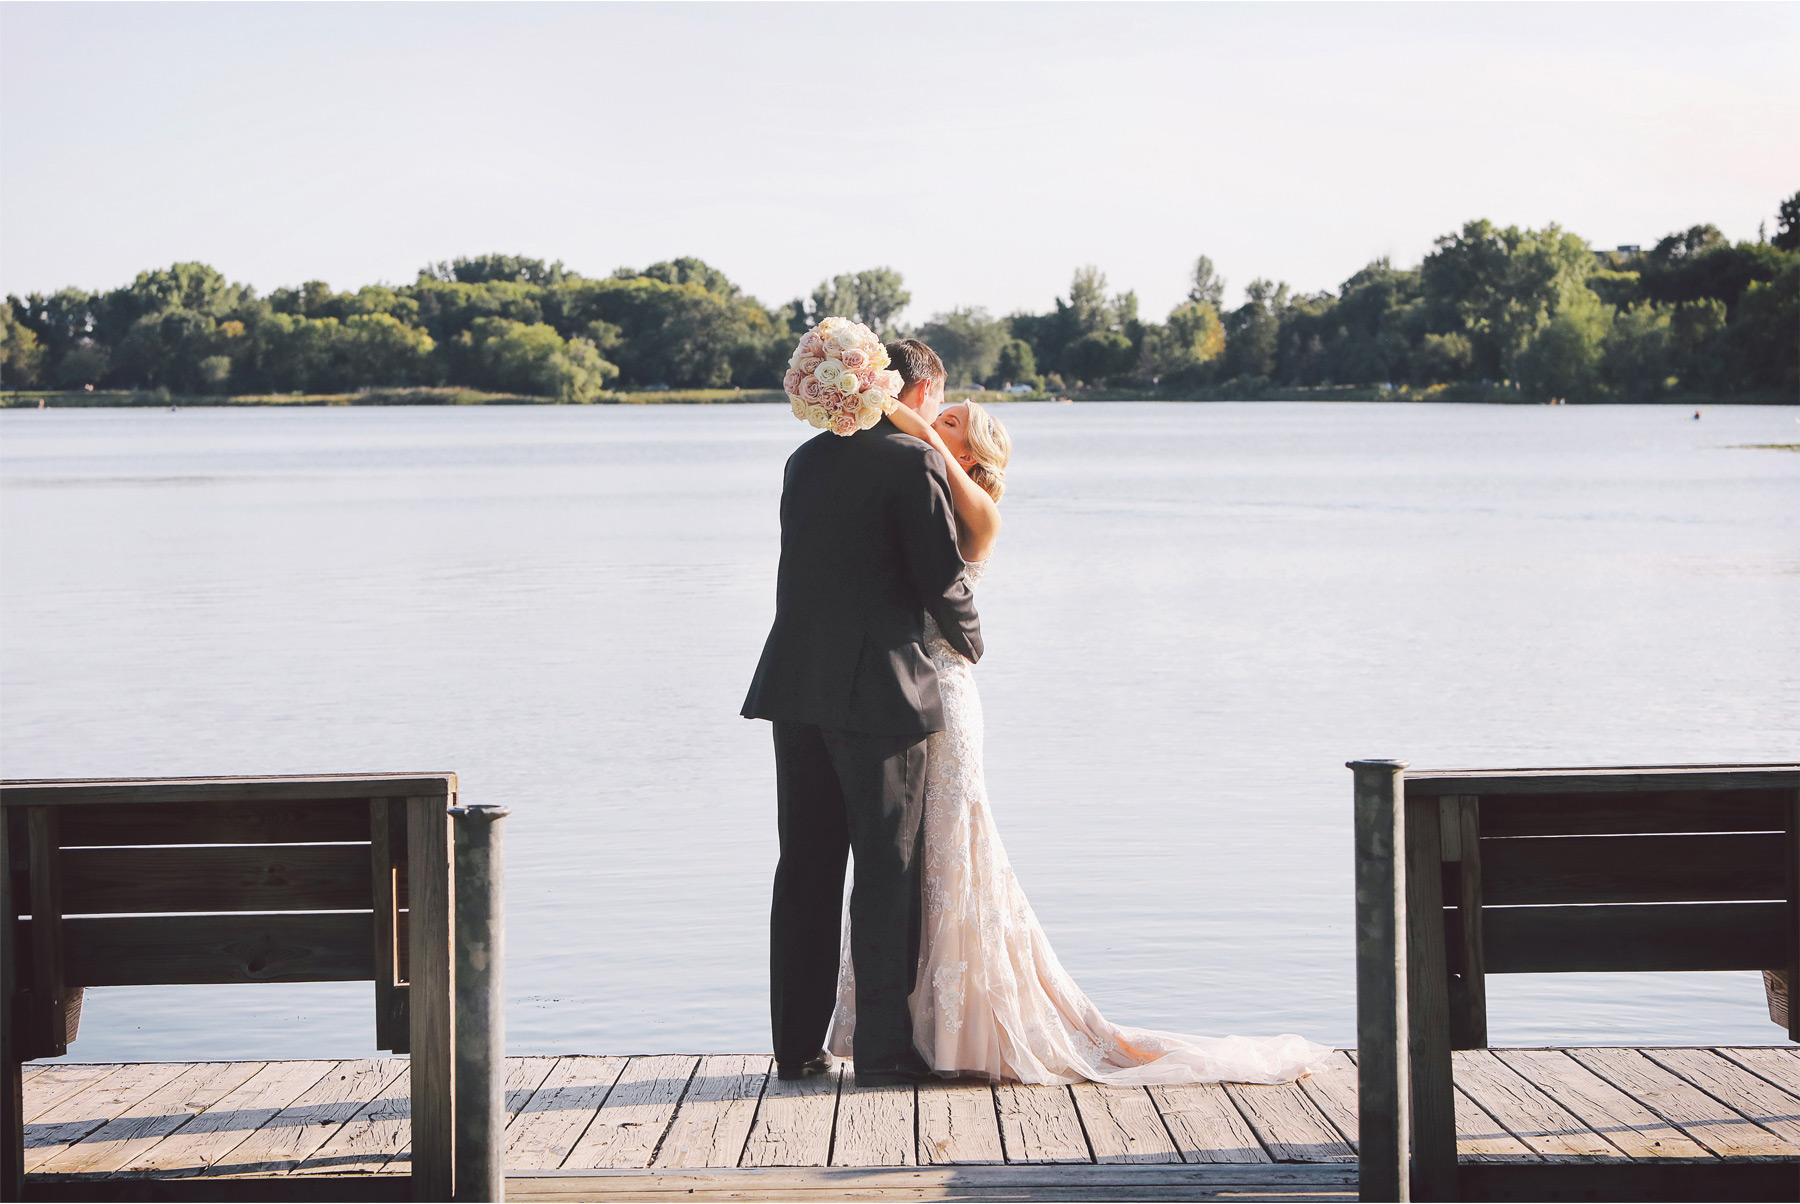 16-Minneapolis-Minnesota-Wedding-Photography-by-Vick-Photography-Lake-of-the-Isles-Jenna-and-Josh.jpg